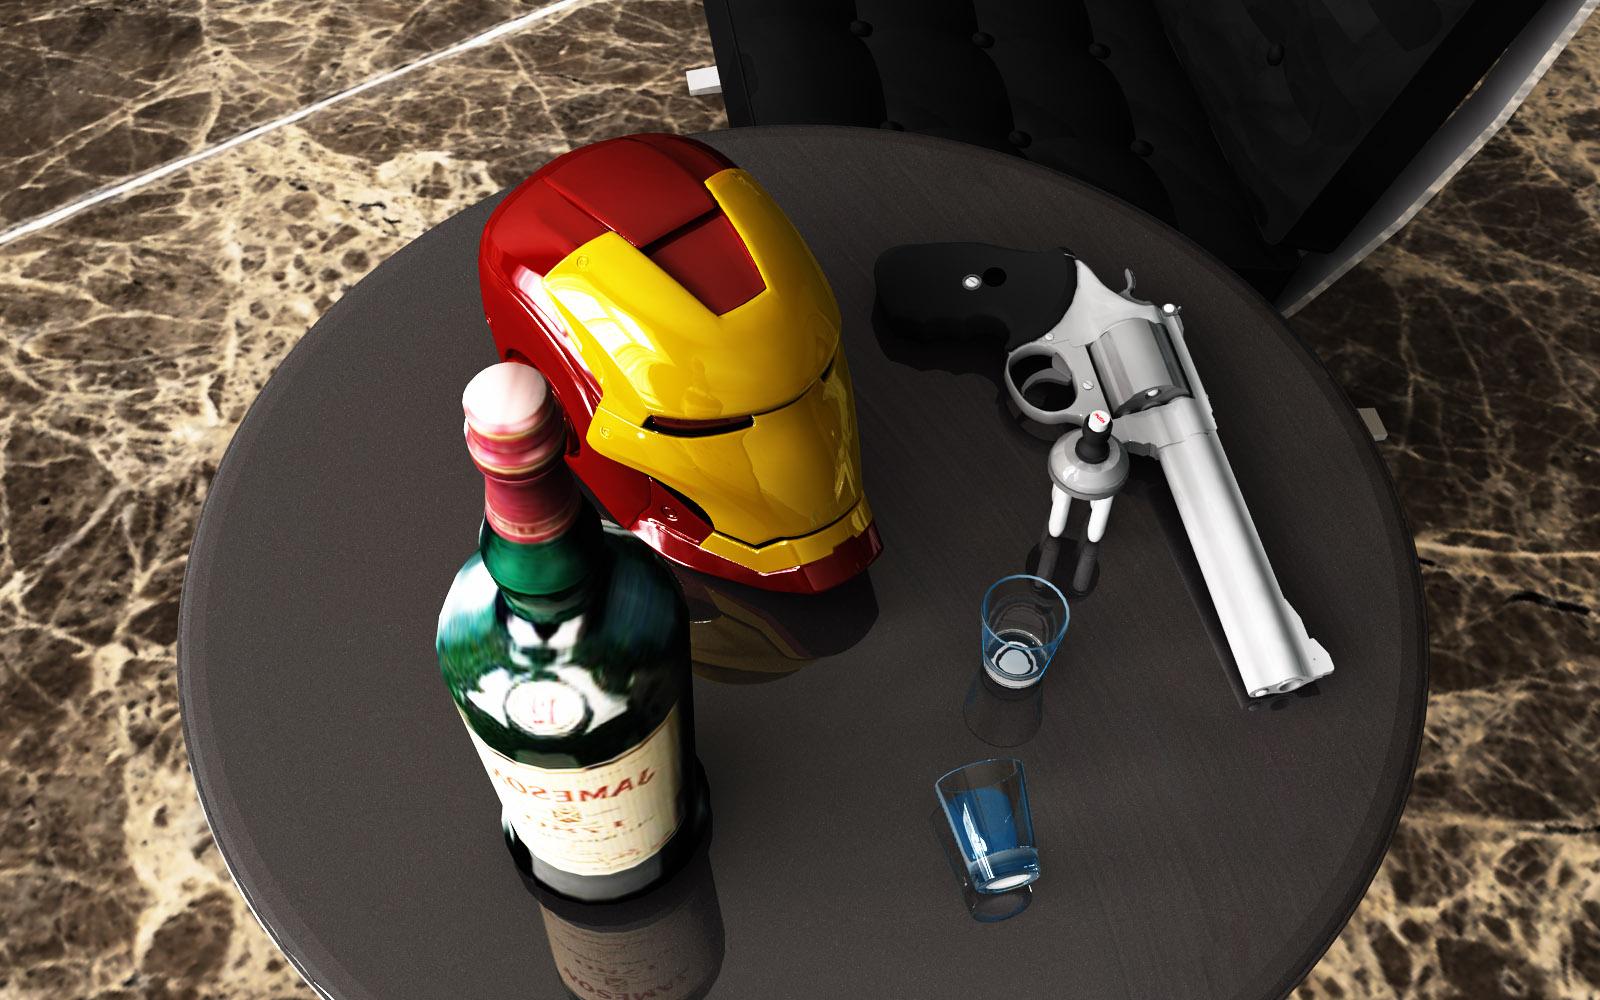 iron man 4 decisions